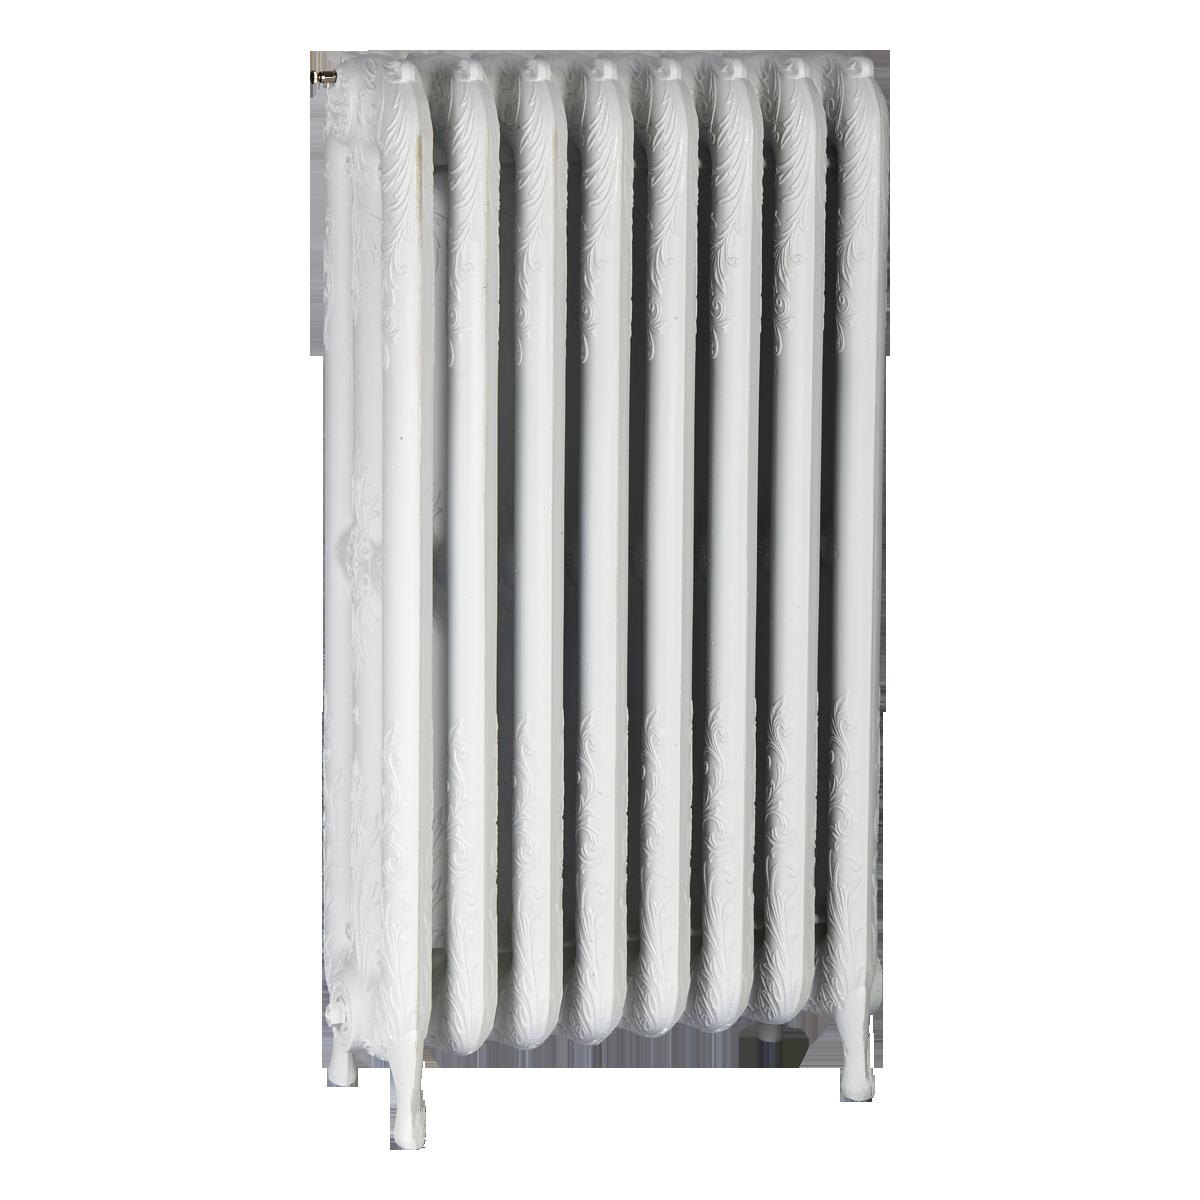 Ironworks Radiators Inc. decorative roll top radiator